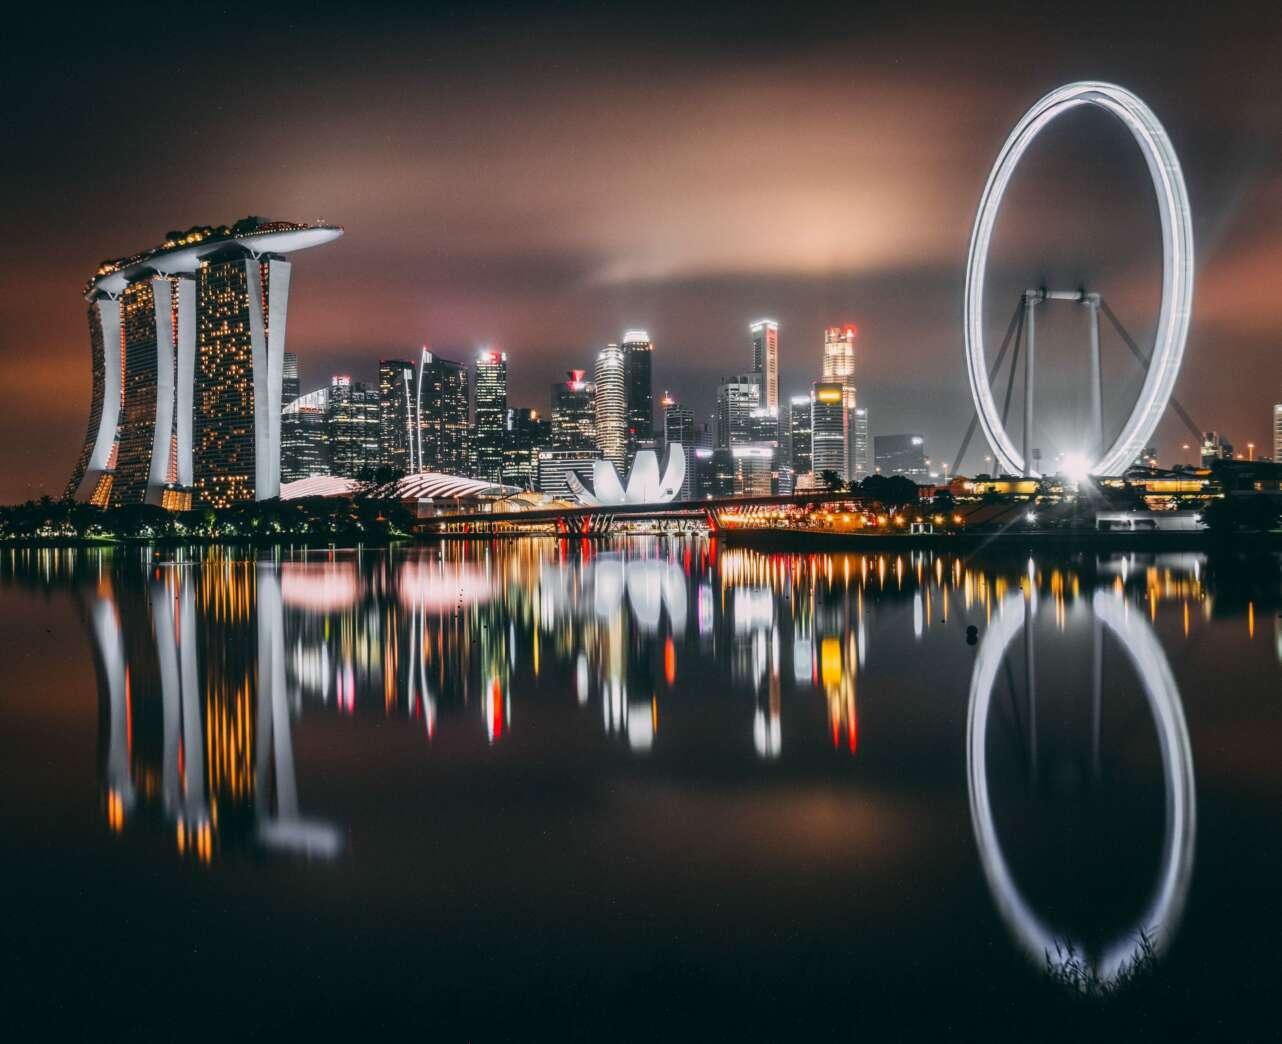 ¿Te apasiona Singapur Infórmate de sus costumbres antes de viajar. Foto: Larry Teo | Unsplash.